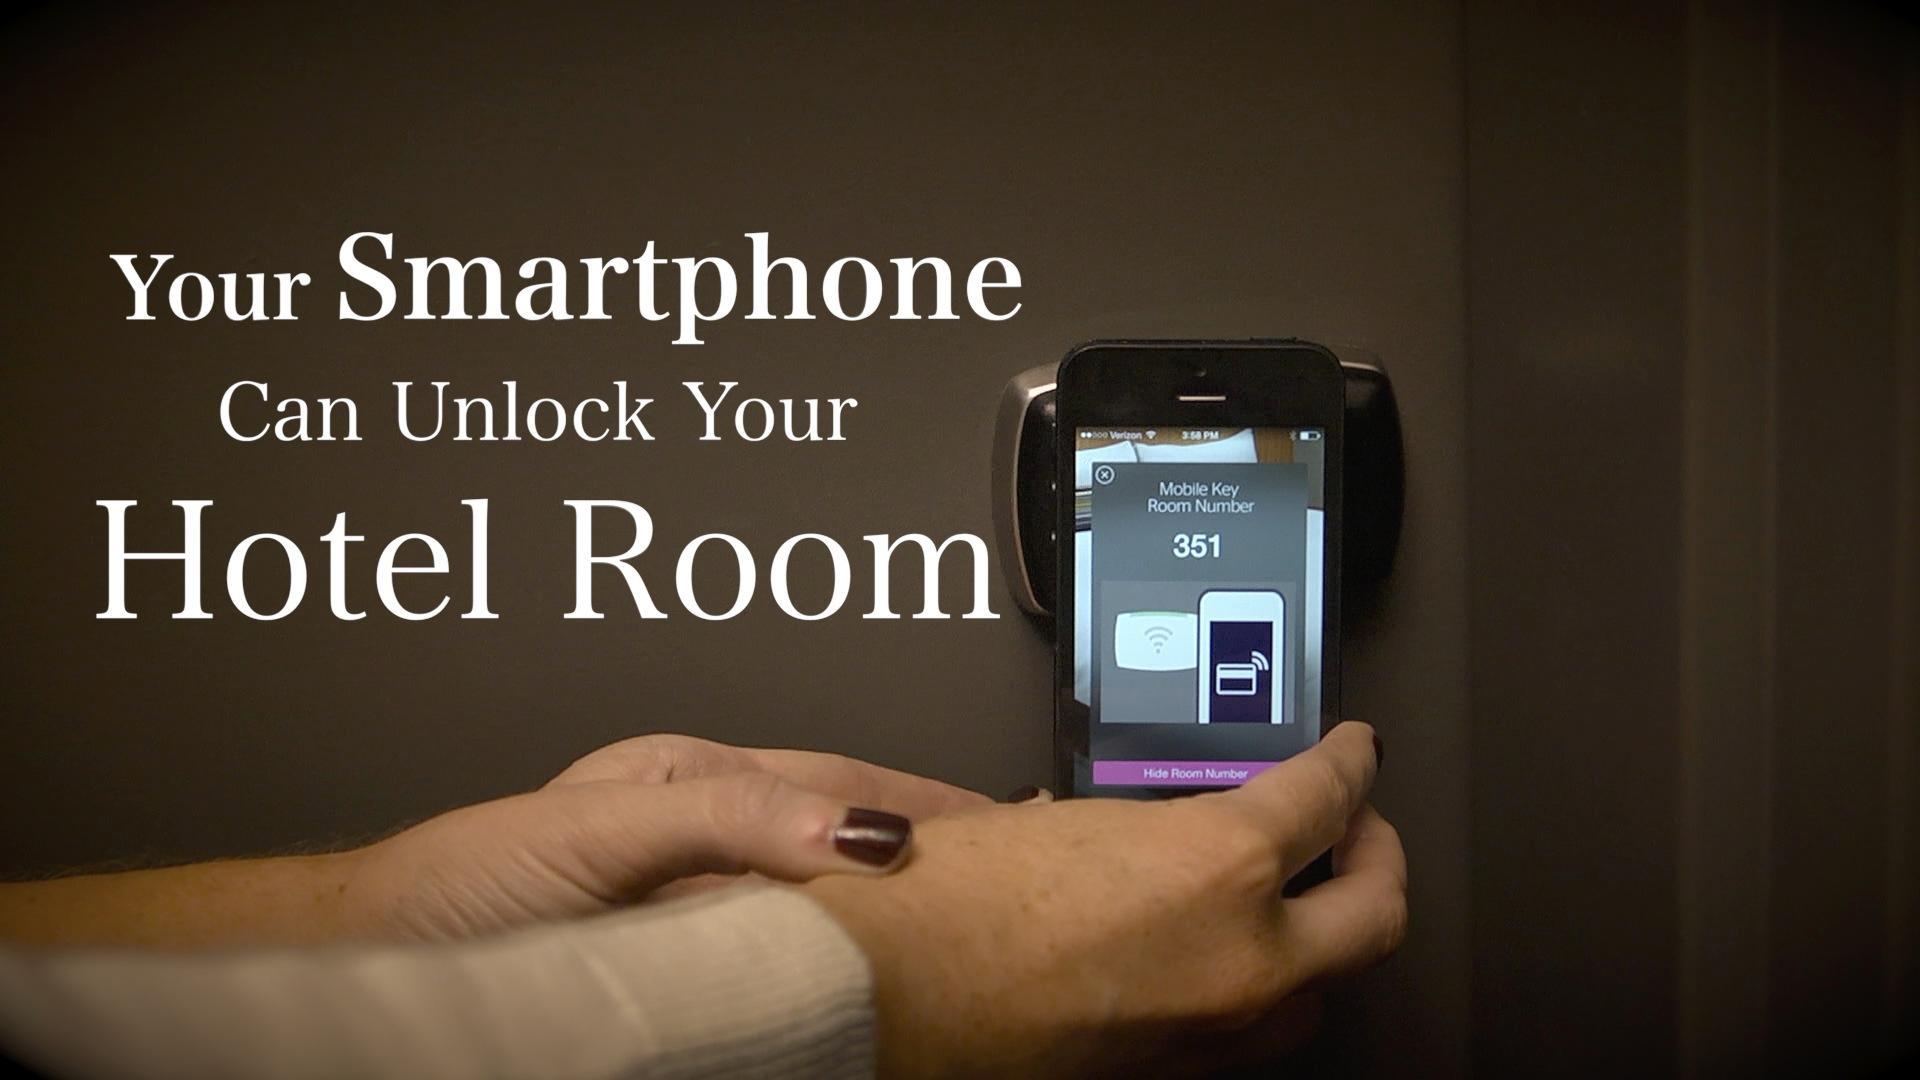 How To Unlock Hotel Room